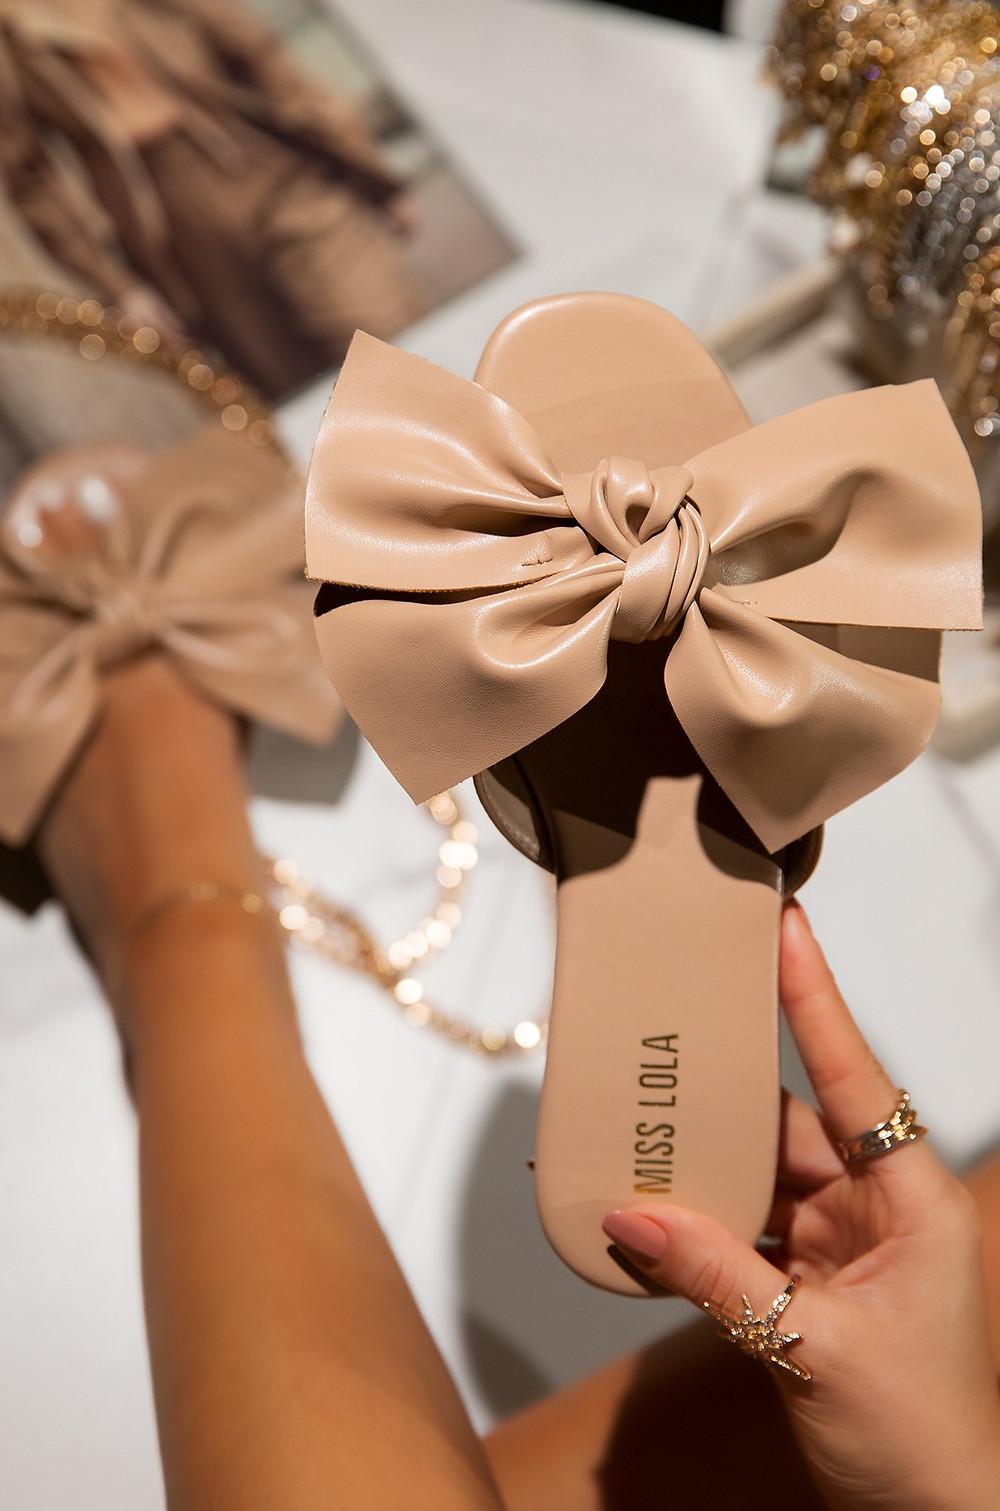 Pretty Girl nude sandals